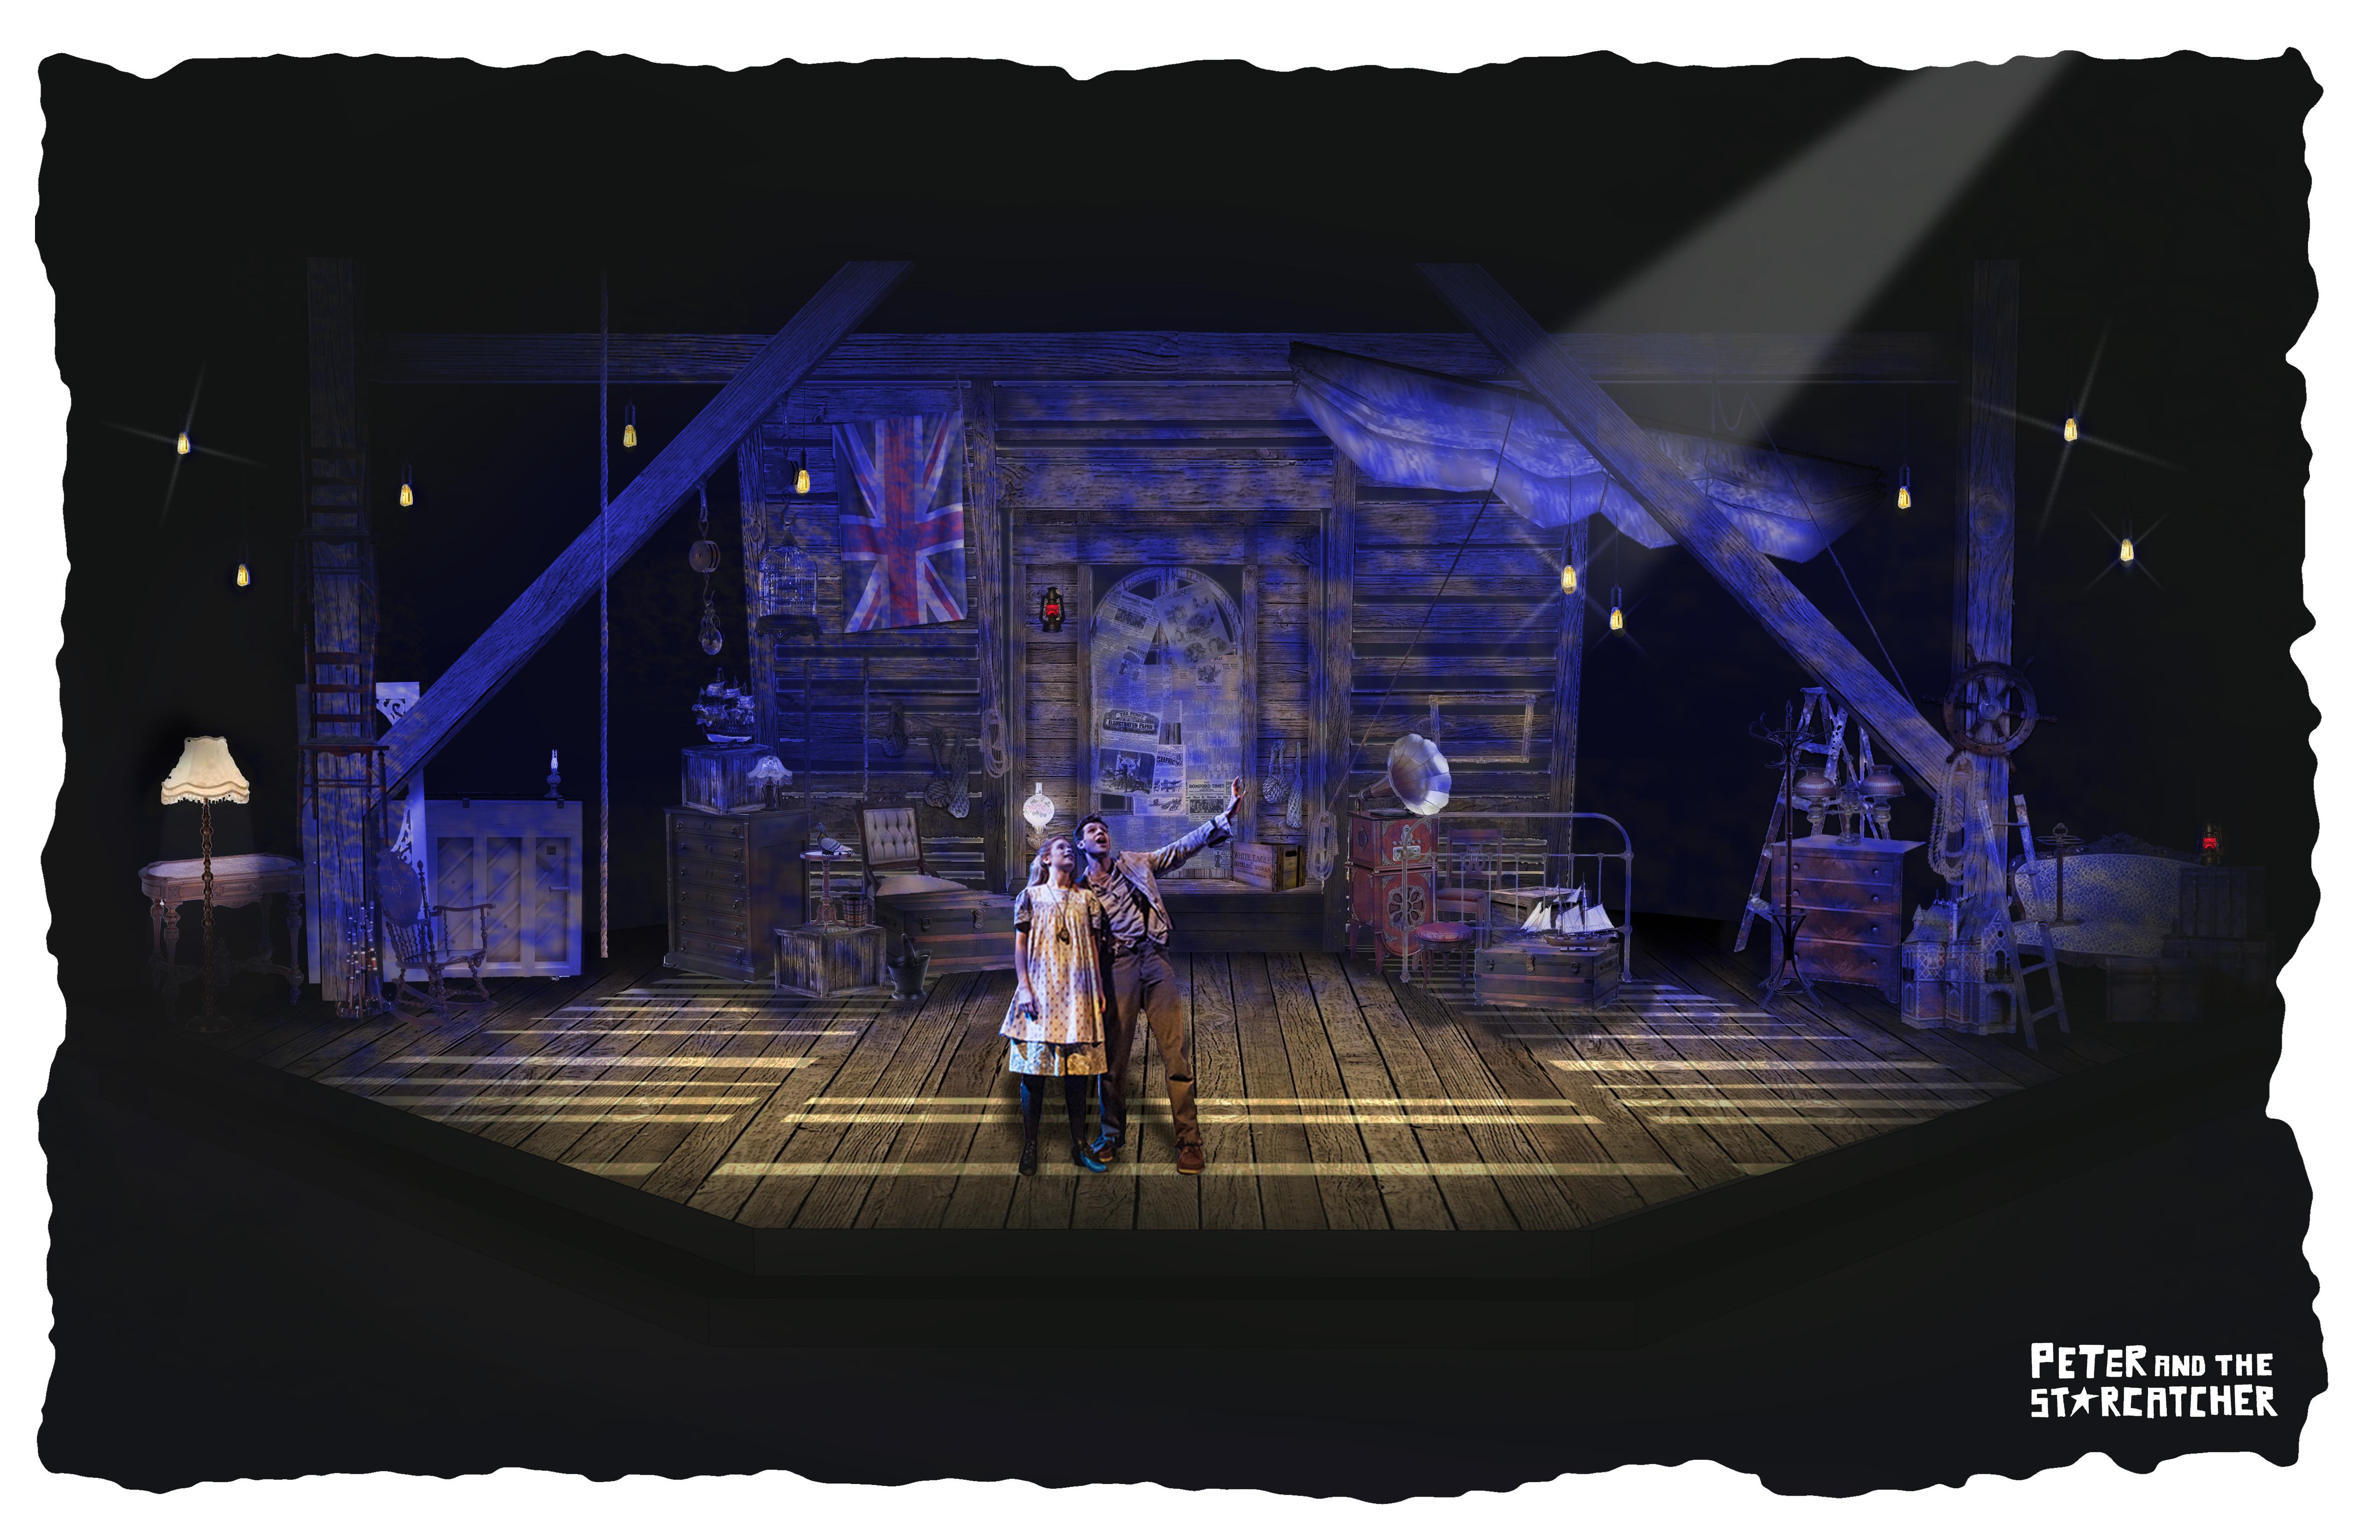 Peter and the Starcatcher - Weathervane Playhouse